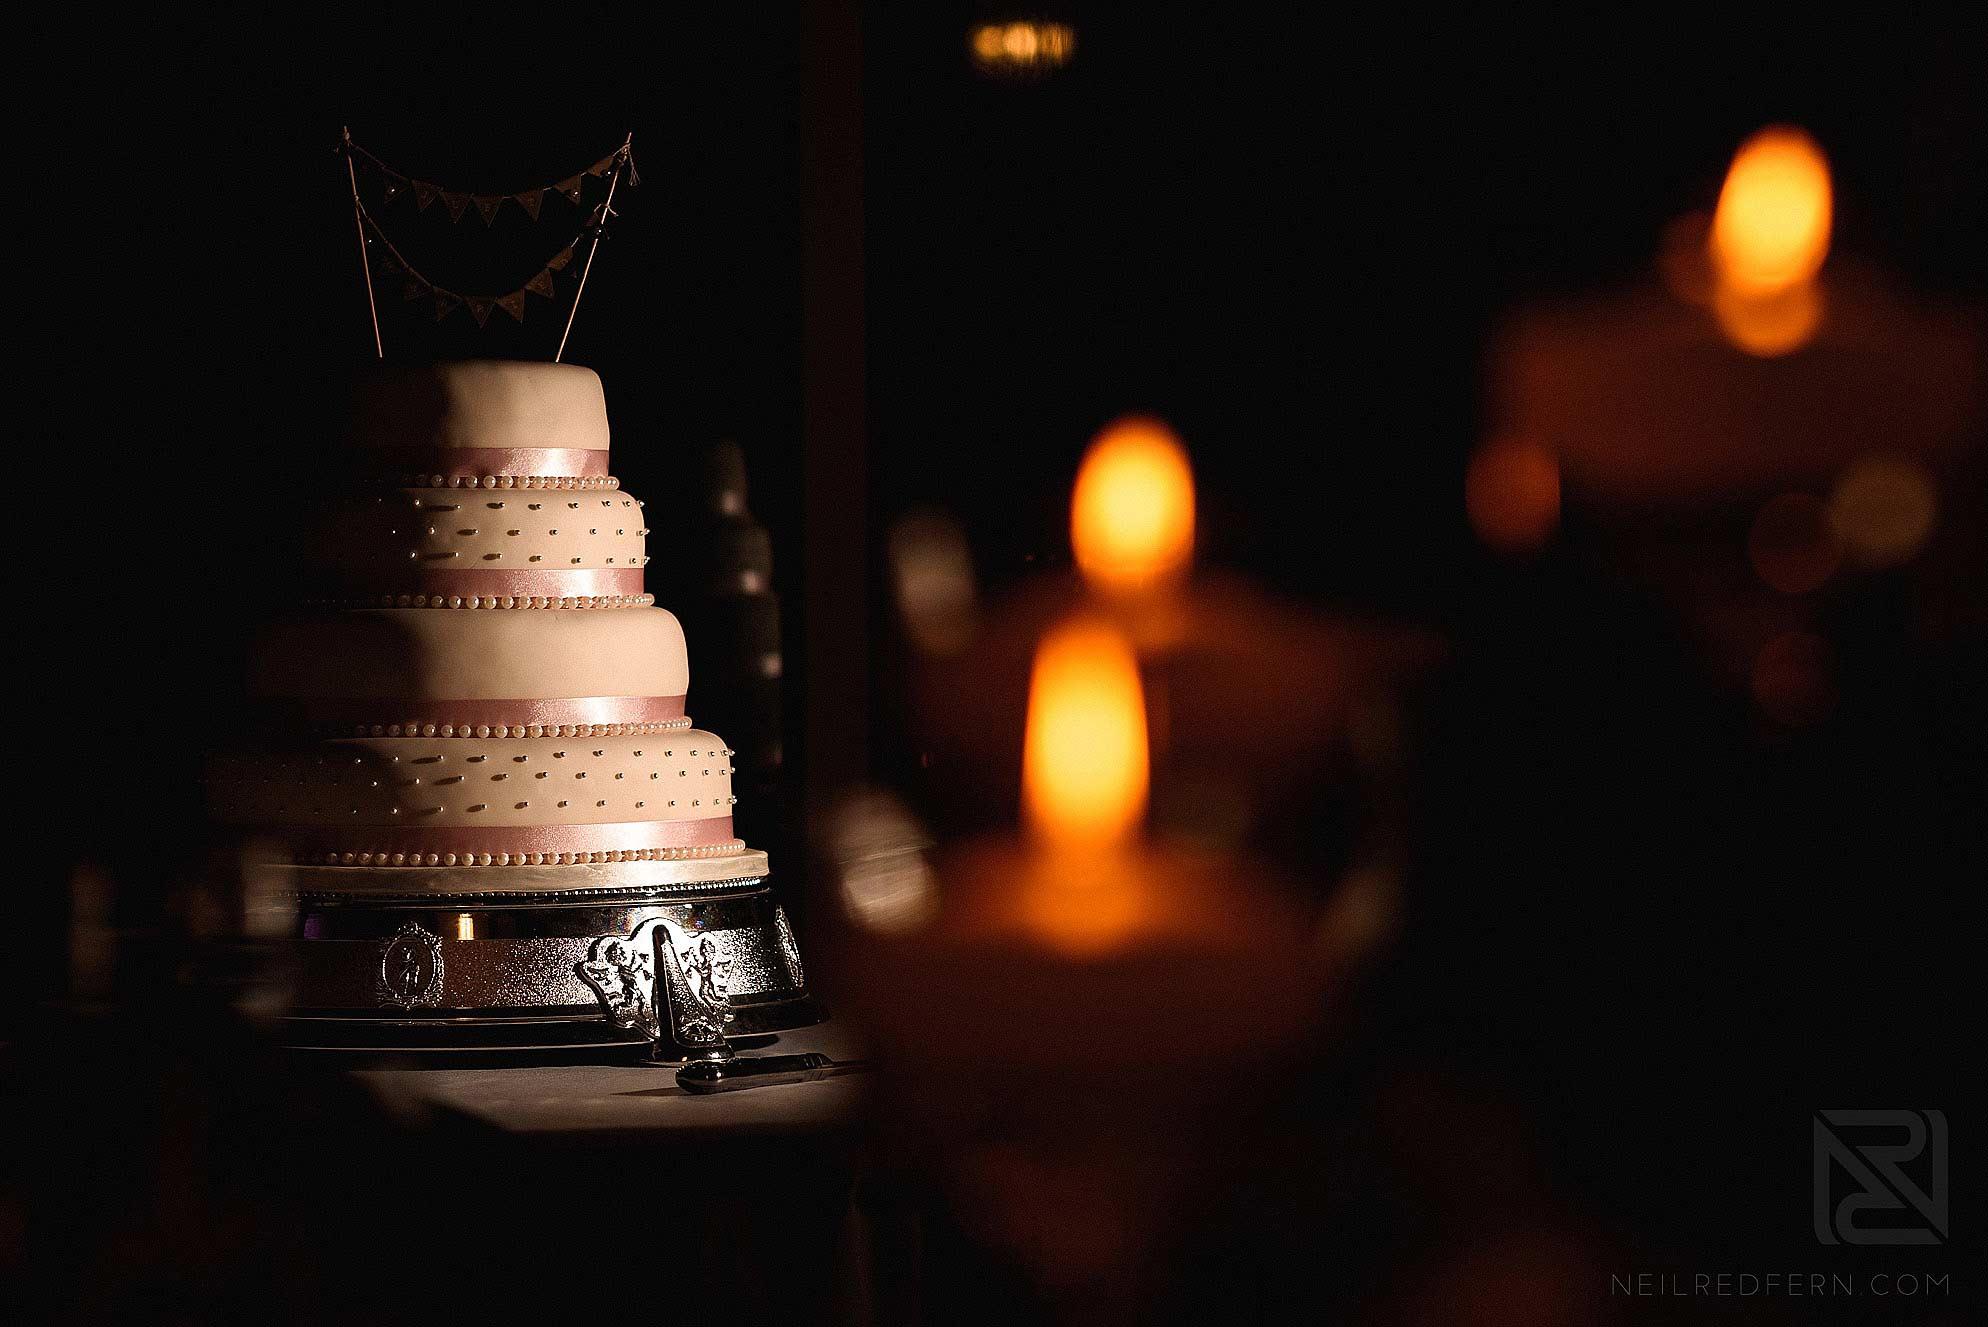 colshaw-hall-wedding-photographs-30